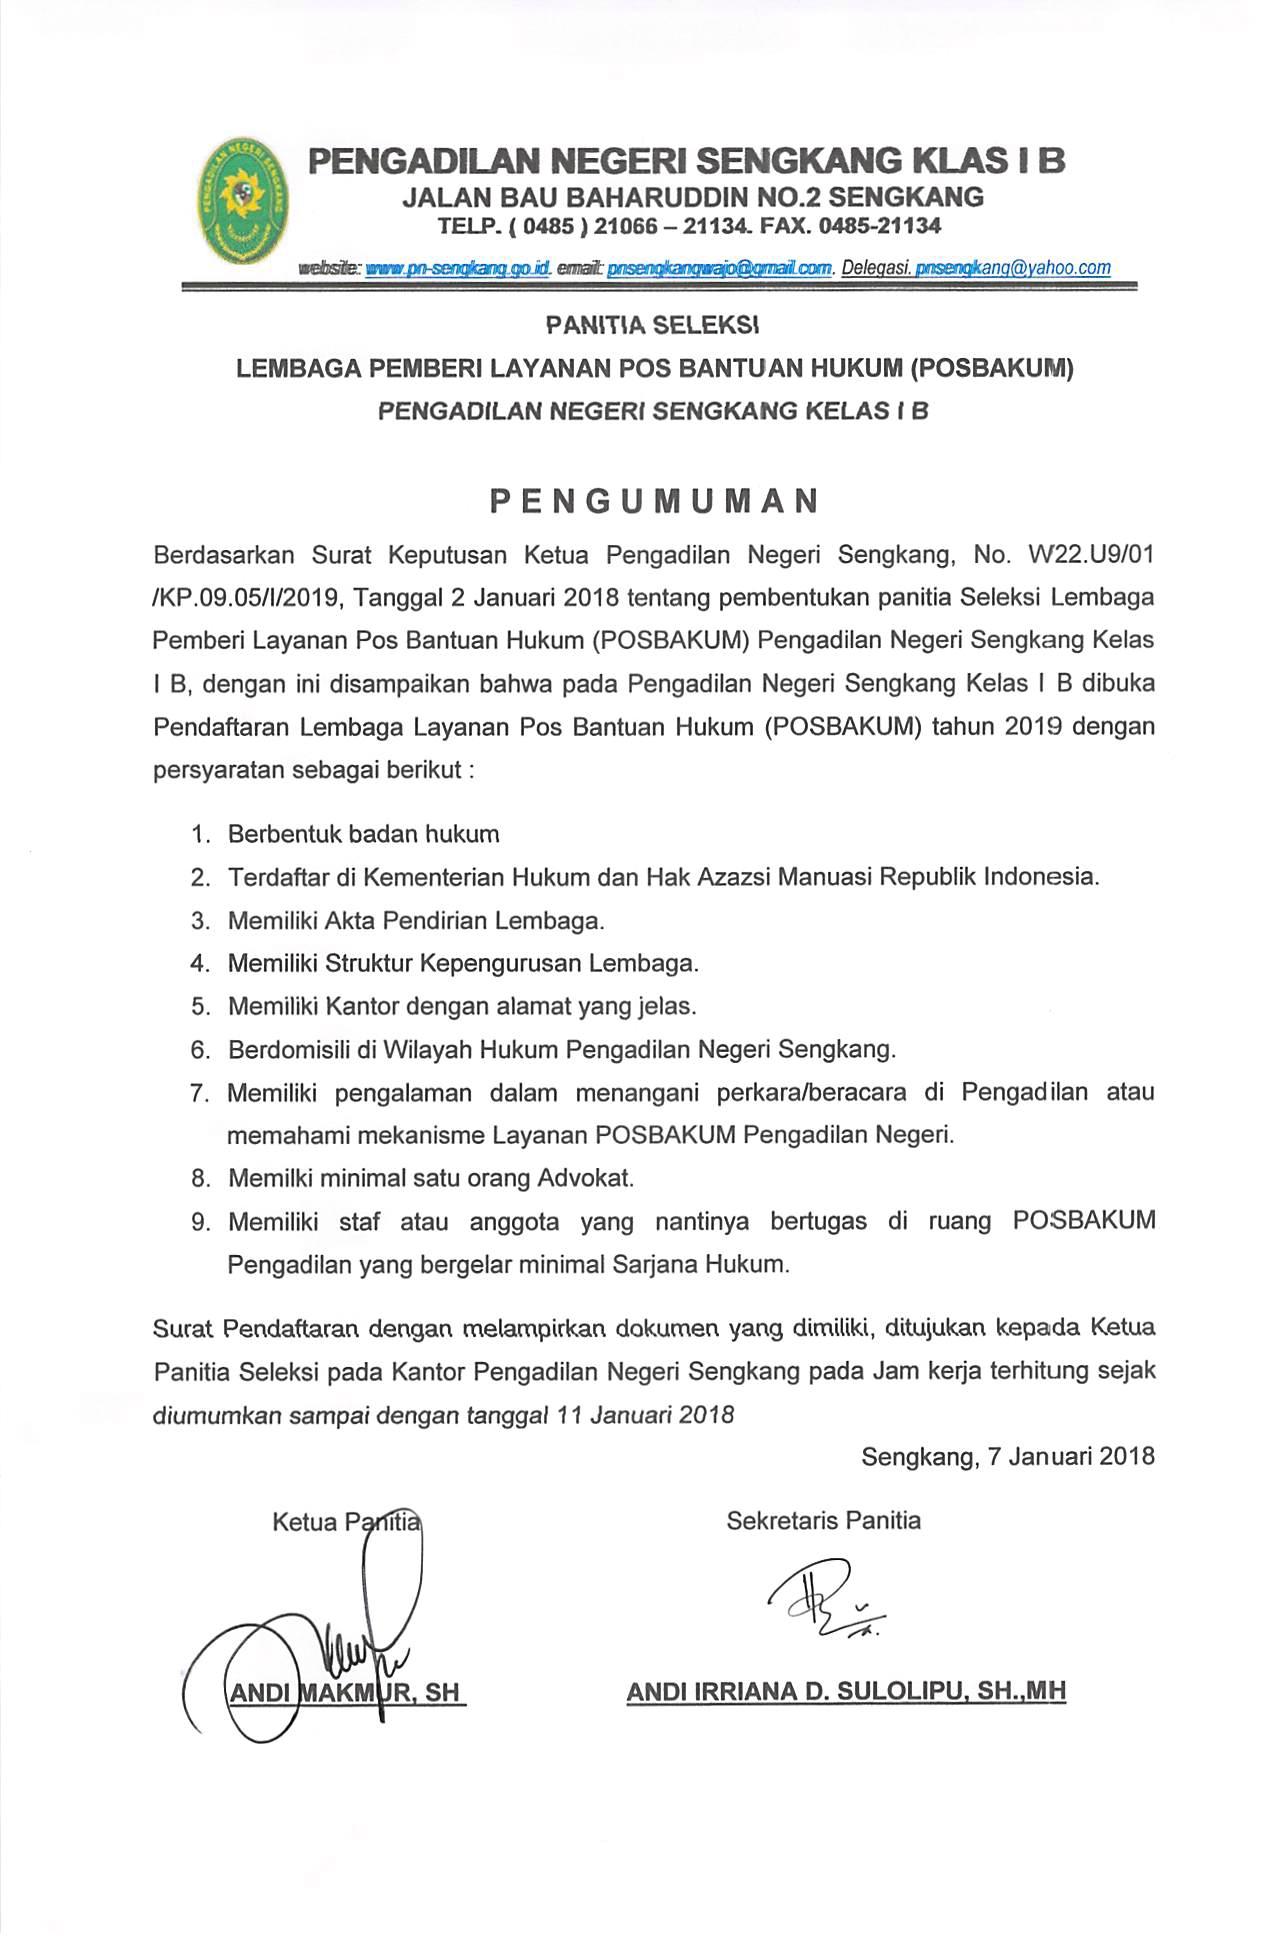 PENGUMUMAN SELEKSI POSBAKUM PN SENGKANG TAHUN 2019